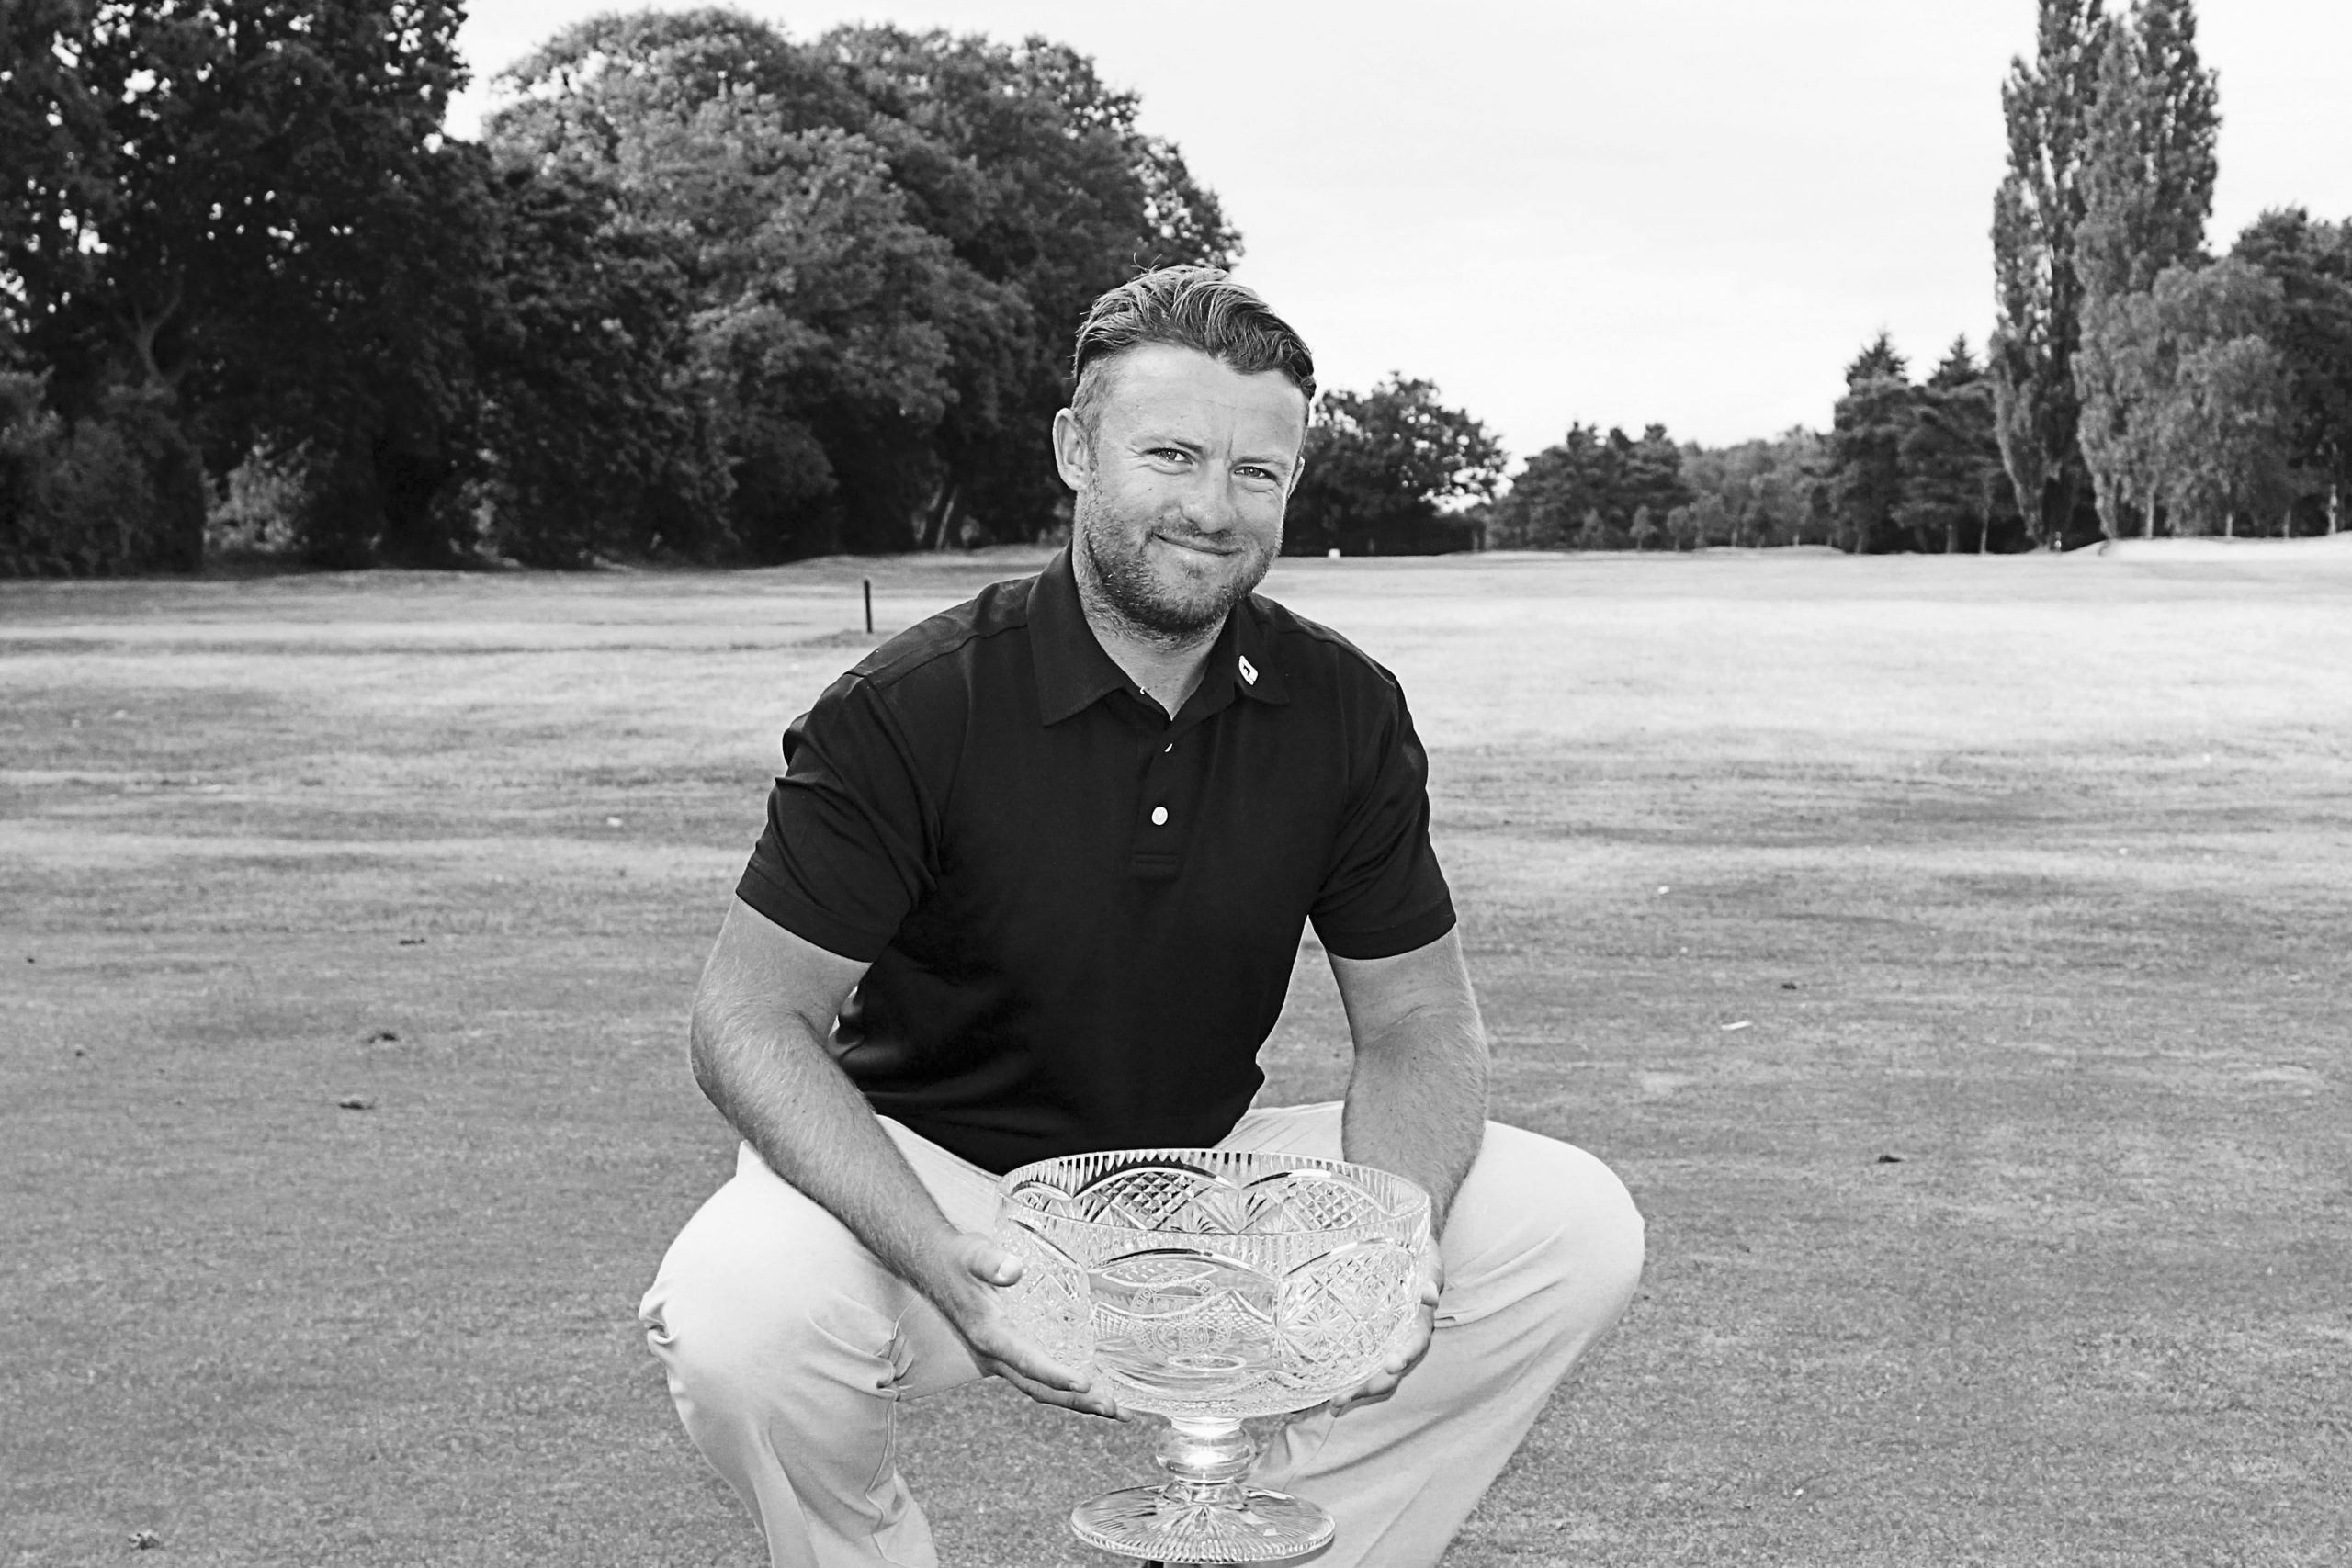 Mark Bell PGA Professional